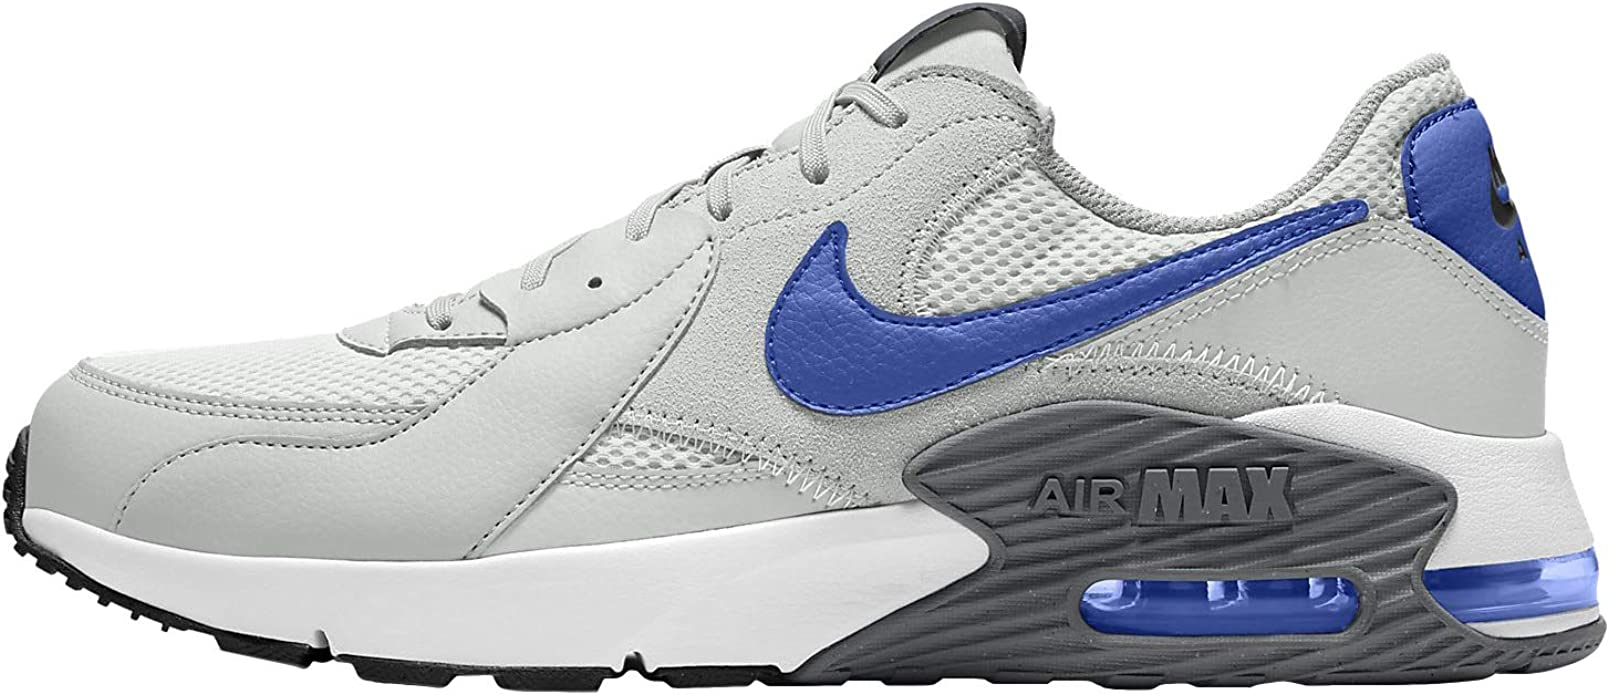 Vuelo brazo Compañero  Amazon.com   Nike Air Max Excee Casual Running Shoe Mens Cd4165-007   Road  Running